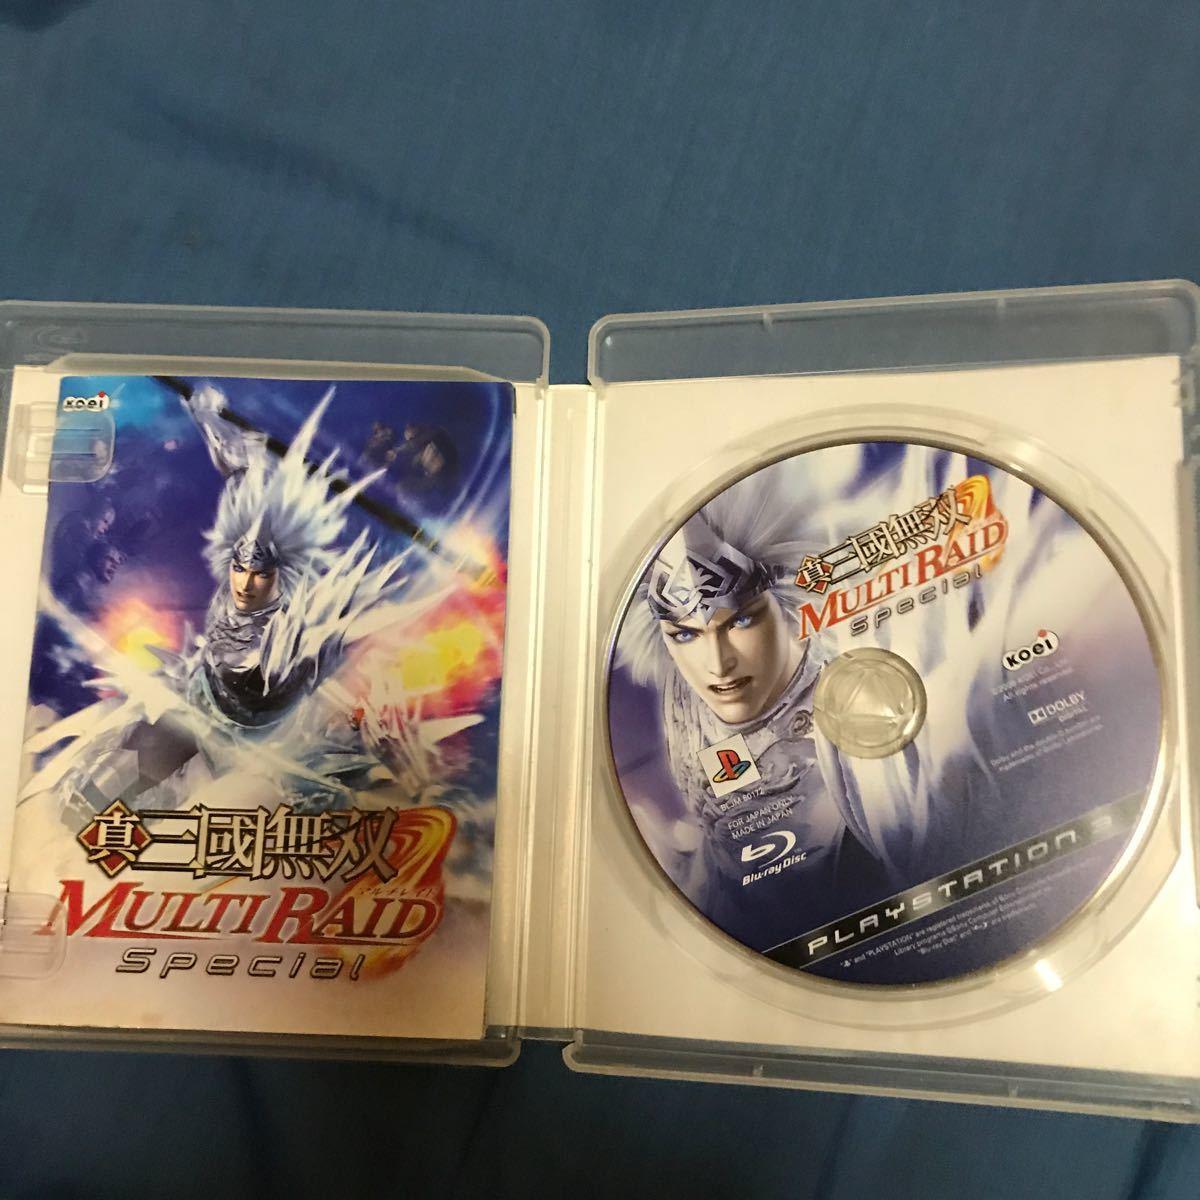 PS3ソフト 真・三國無双シリーズ2本セット販売!真・三國無双MULTI RAID Special/真・三國無双5